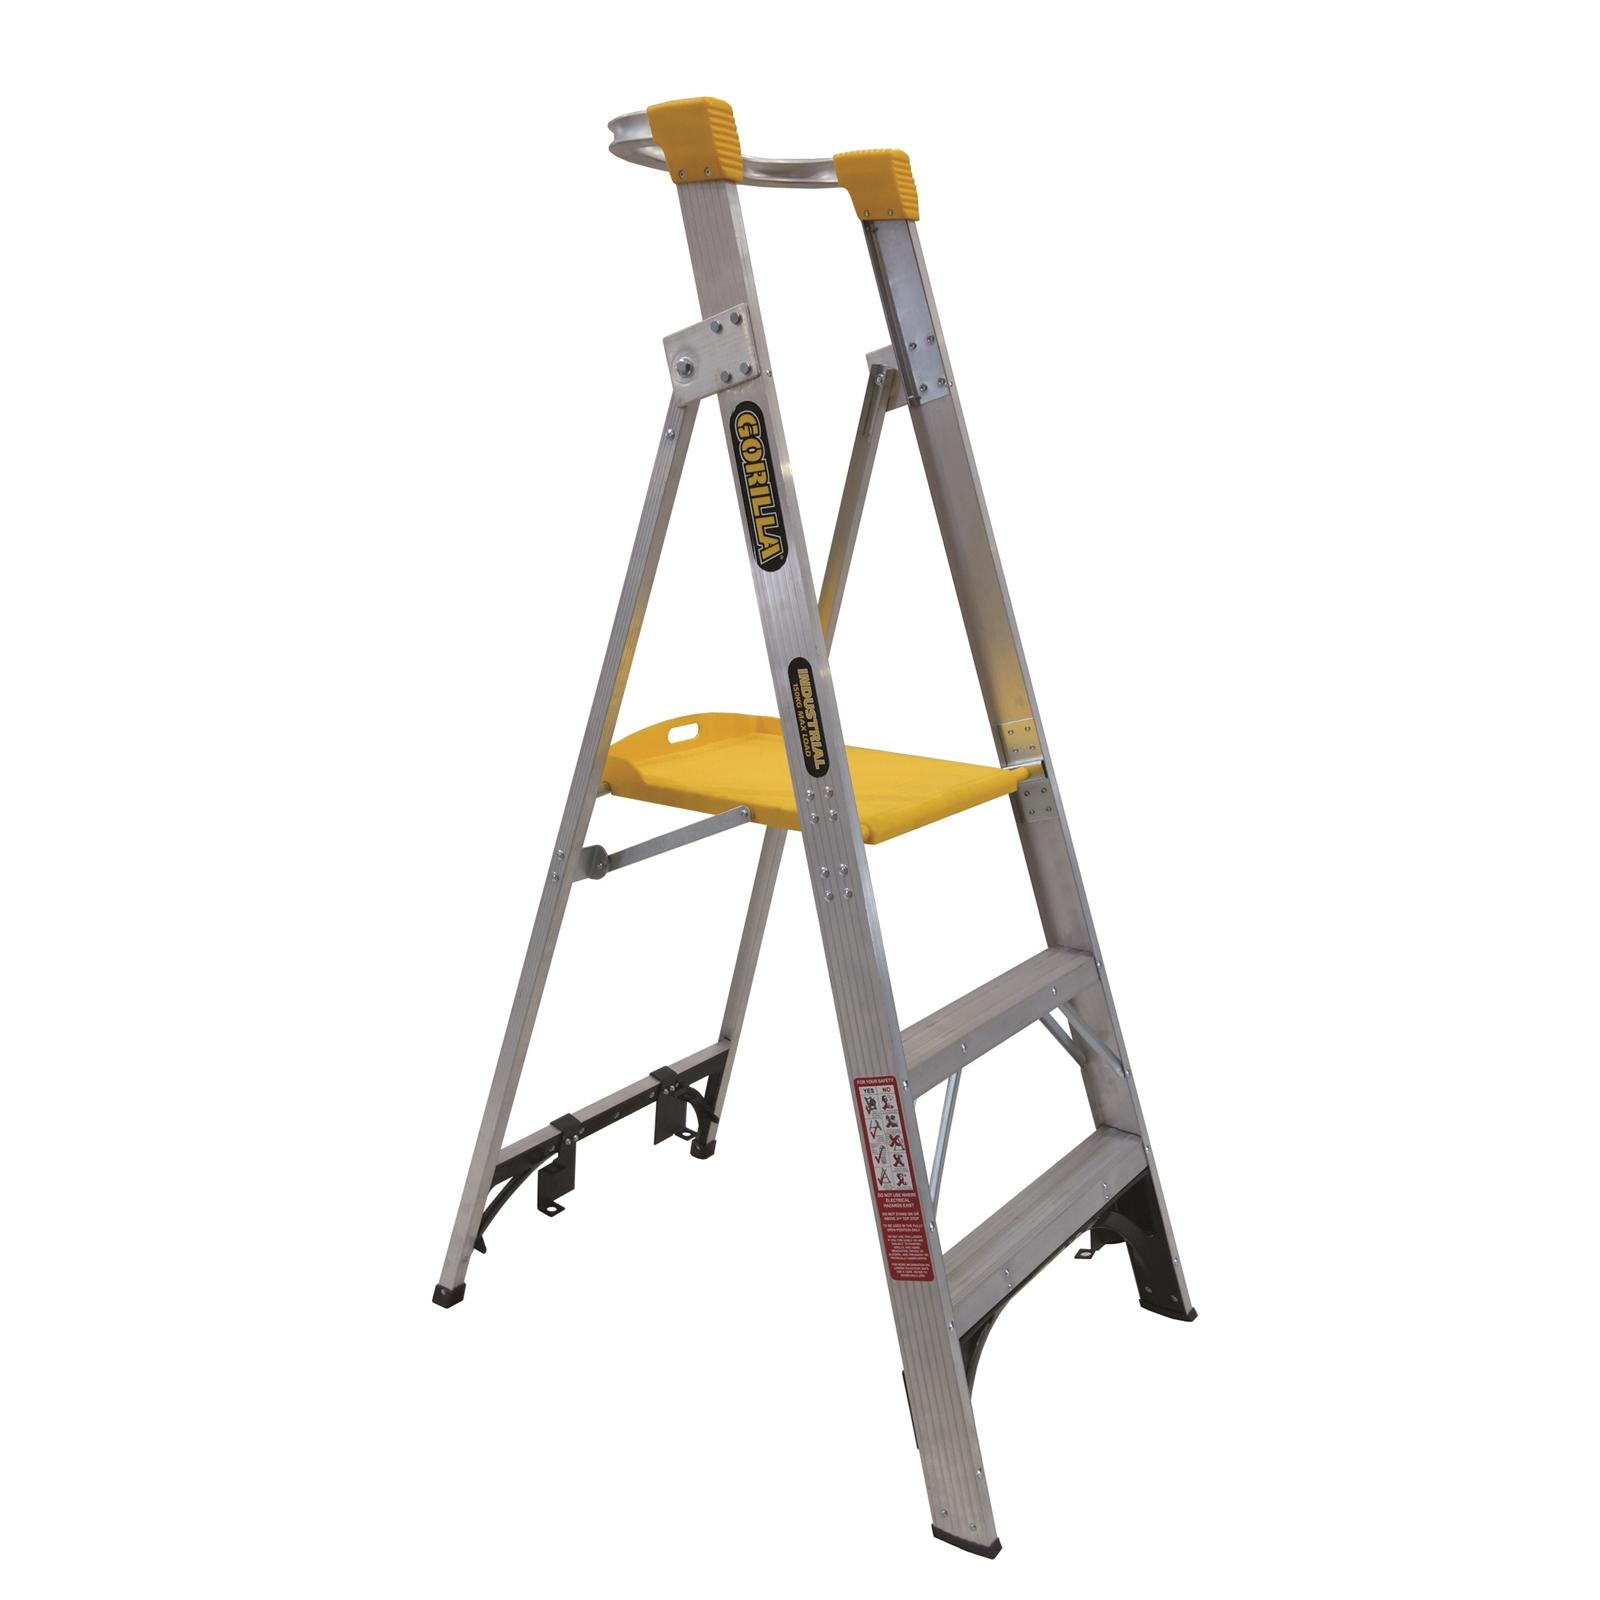 Gorilla Aluminium Platform Ladder 3 Steps 6ft 3ft 1 8m 0